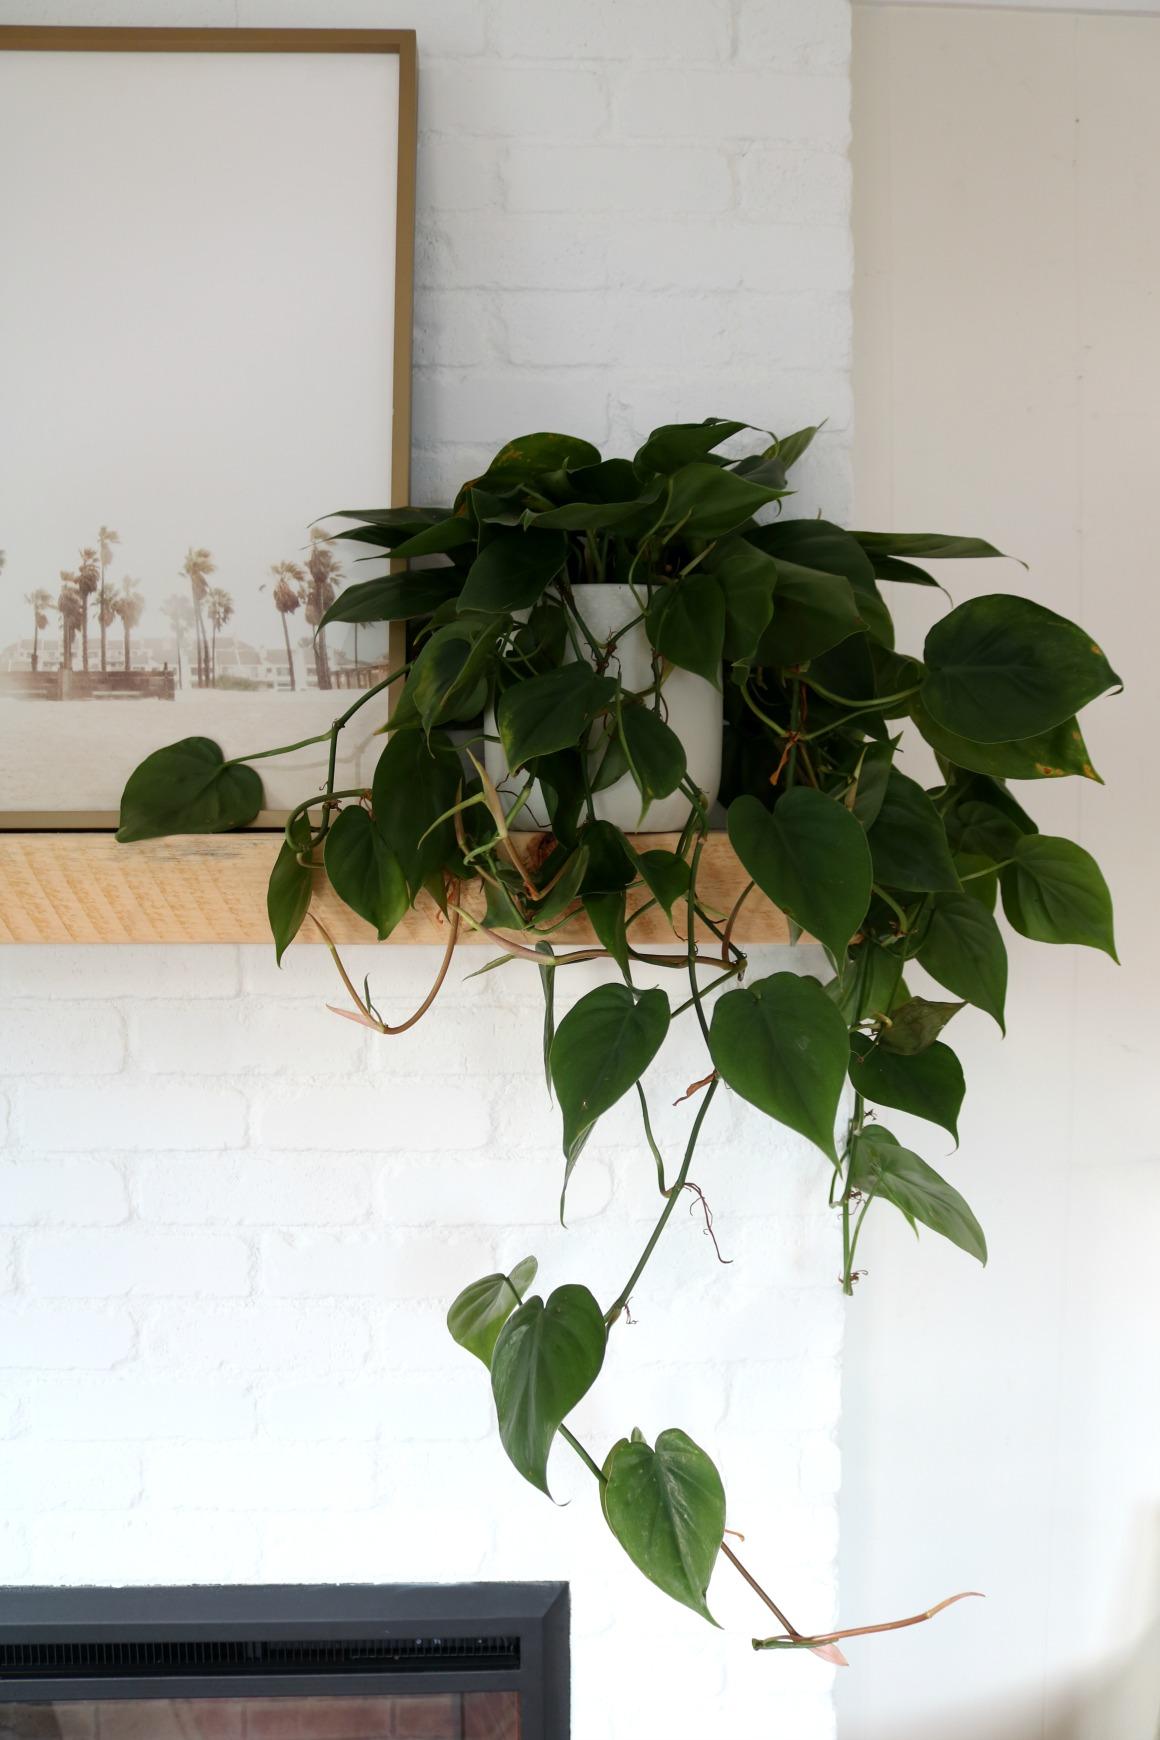 Easiest Houseplants to keep alive- Why I LOVE houseplants